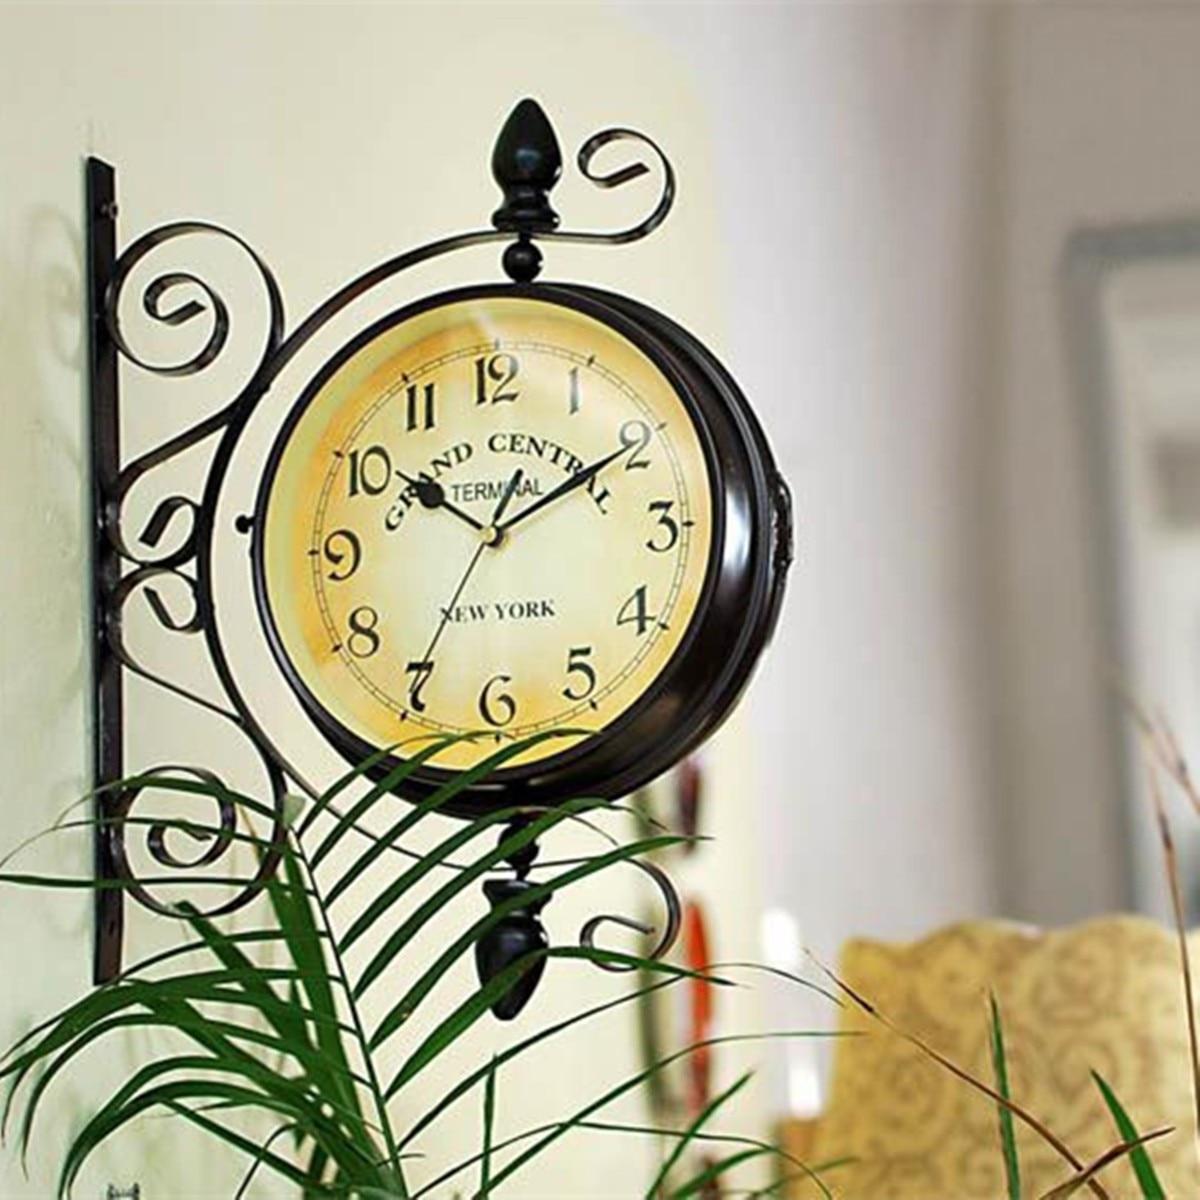 Retro Double Side Rotating Wall Clock Metal Hanging Clock Outdoor /Home/Garden Decor European Clock Gift Wall Mounted+Bracket